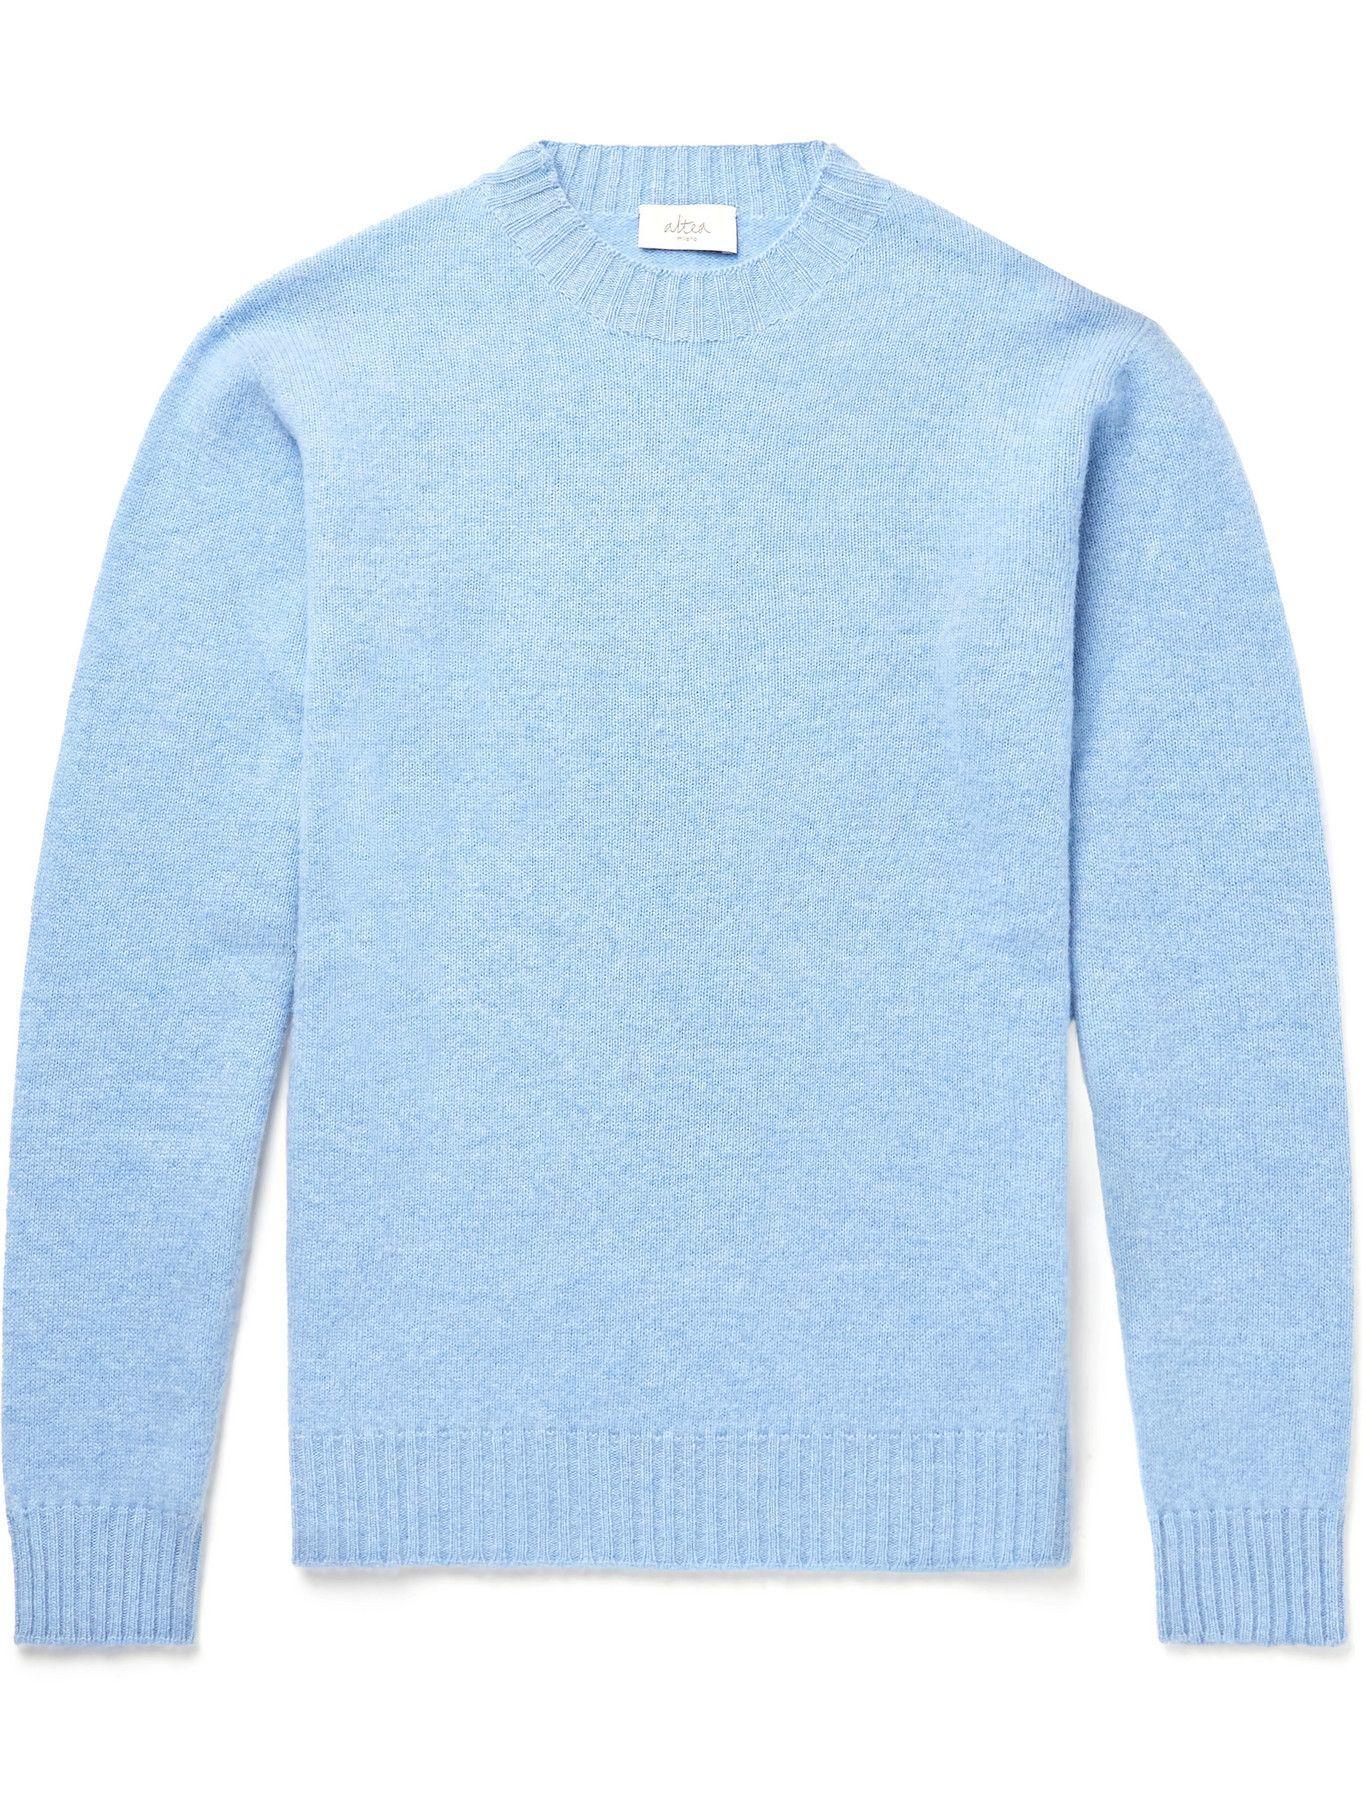 Photo: ALTEA - Virgin Wool and Cashmere-Blend Sweater - Blue